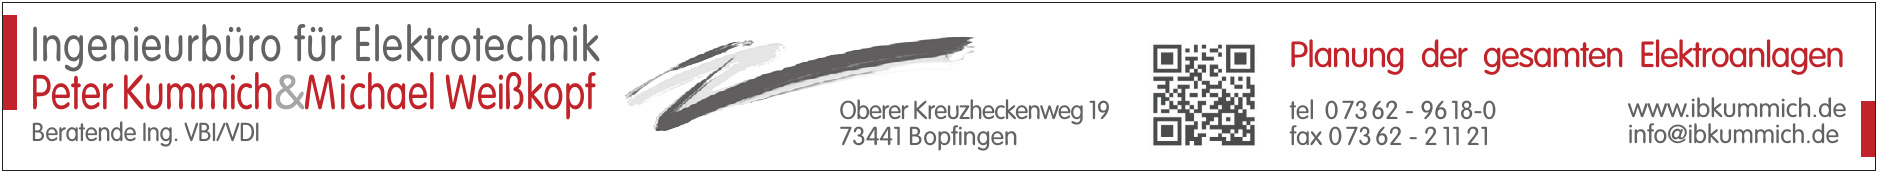 Ingenieurbüro für Elektrotechnik Peter Kummich & Michael Weißkopf